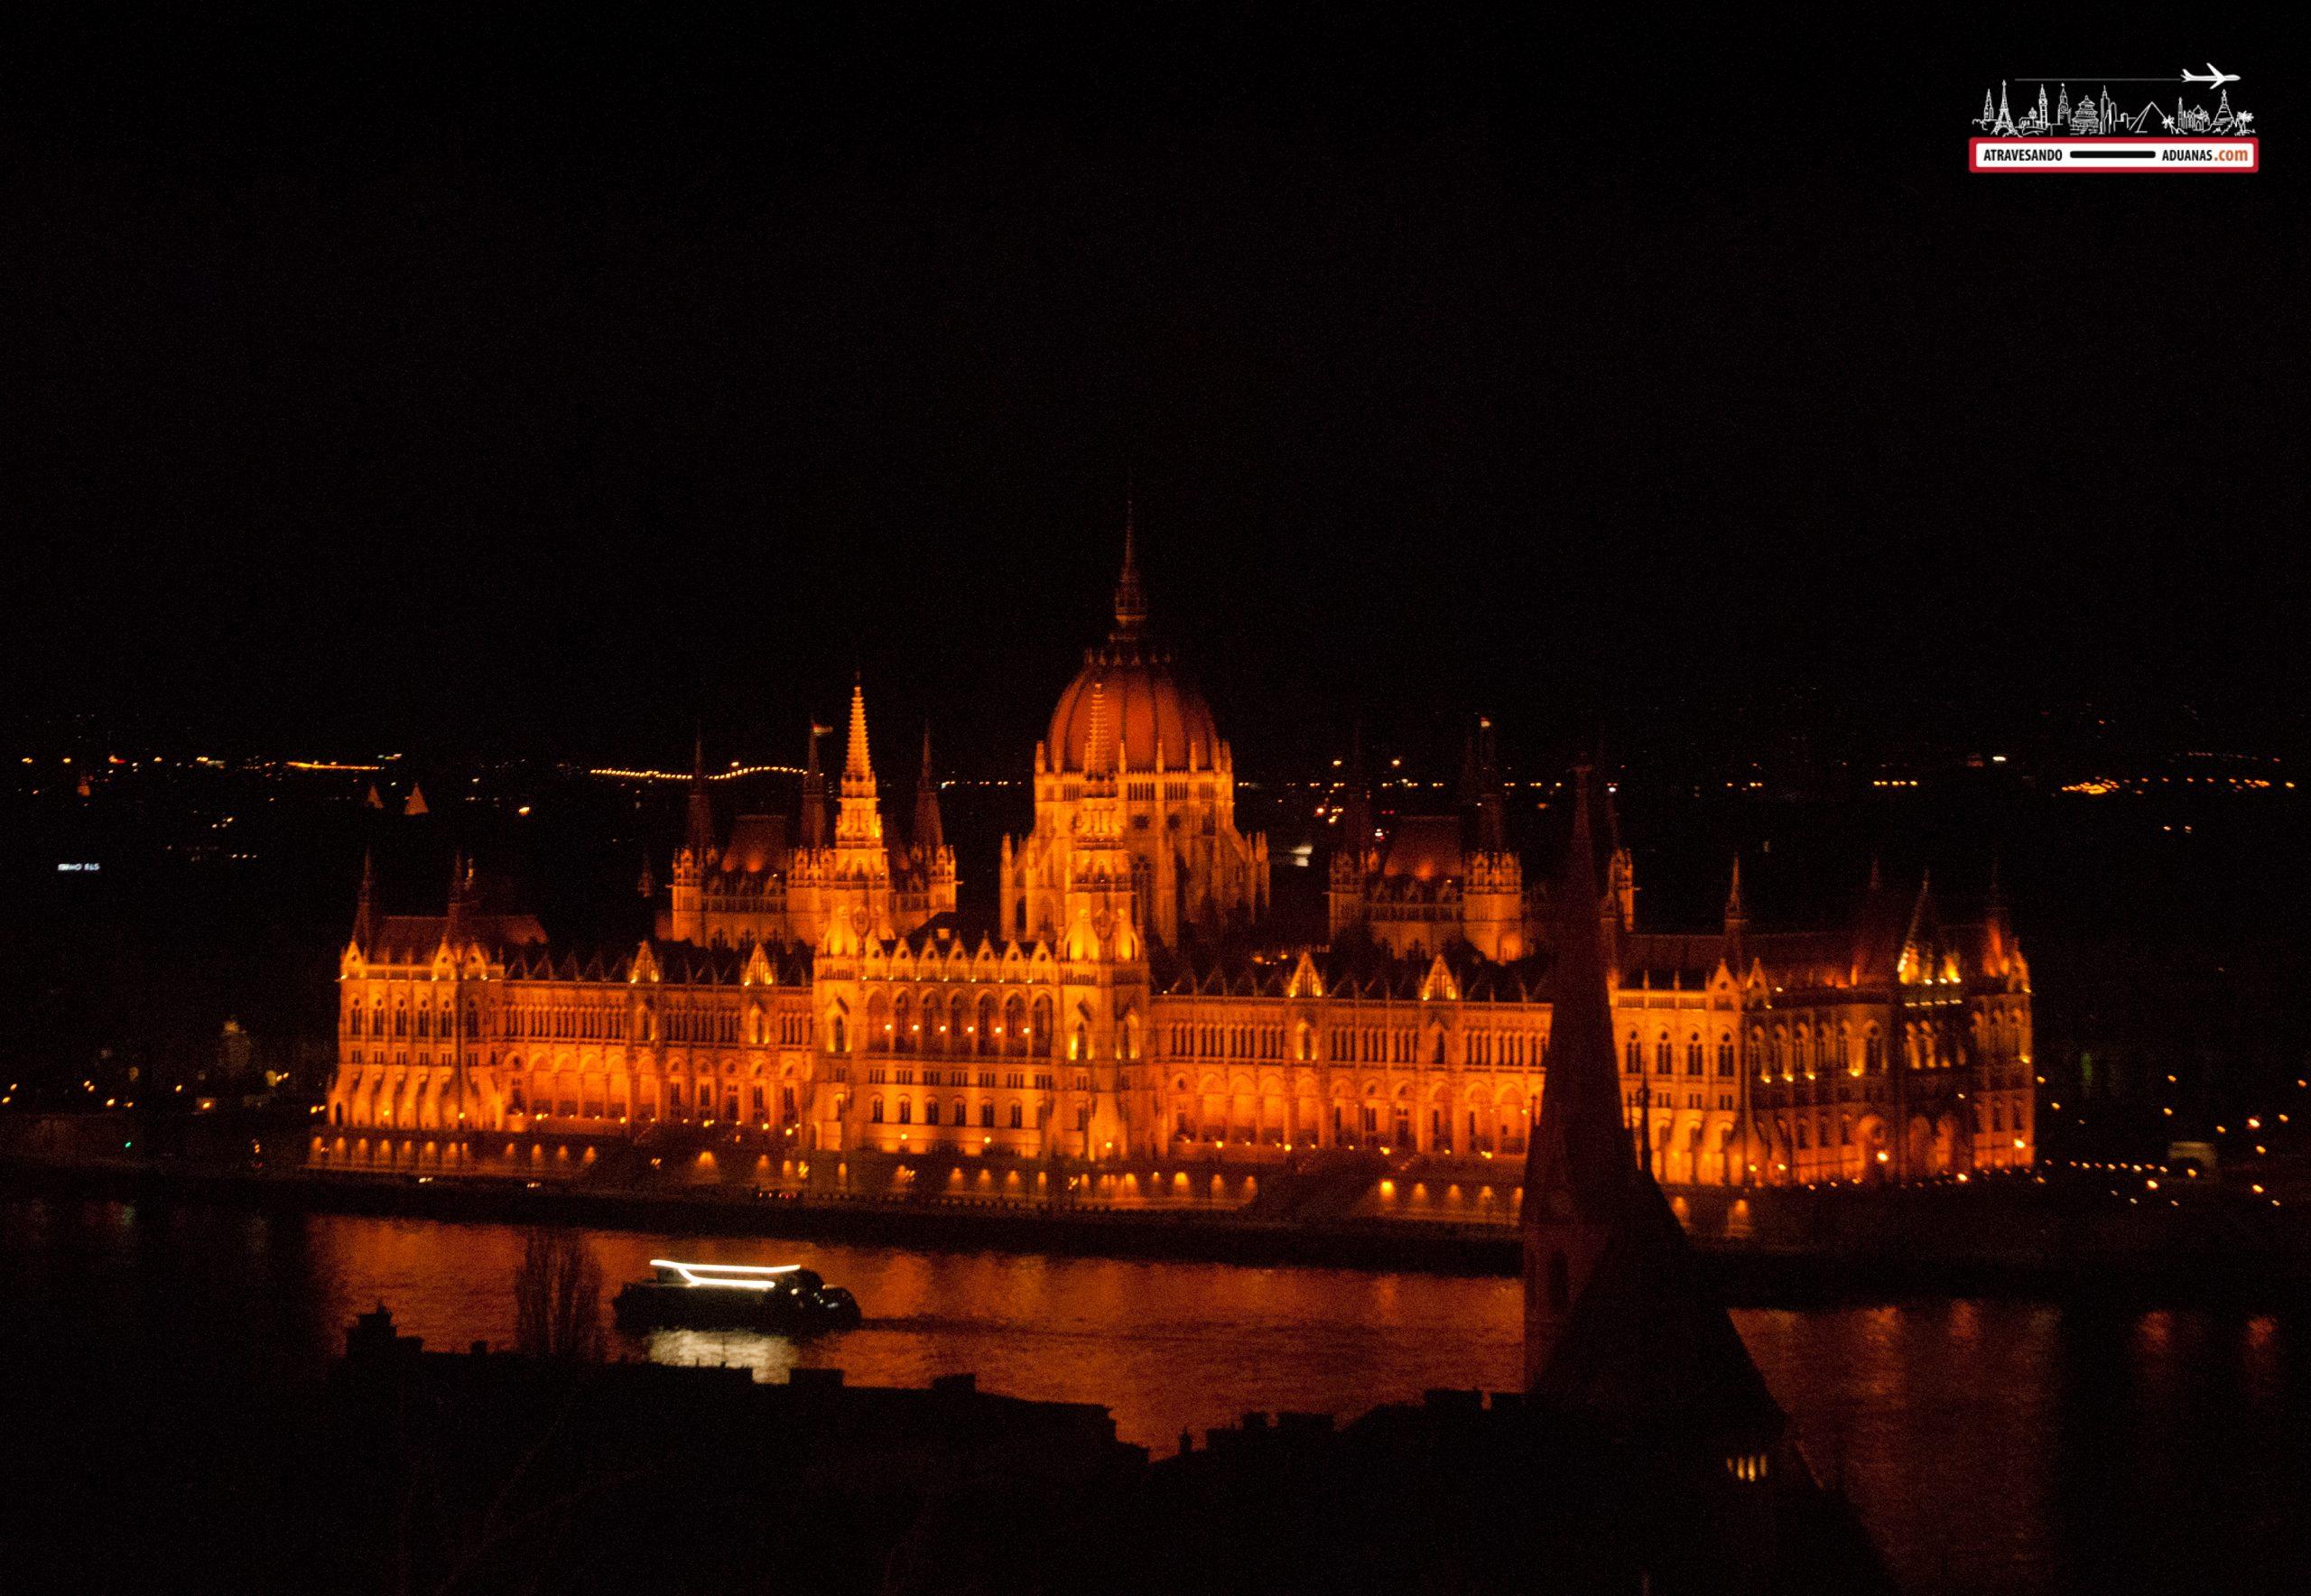 Parlamento de Budapest caída la noche